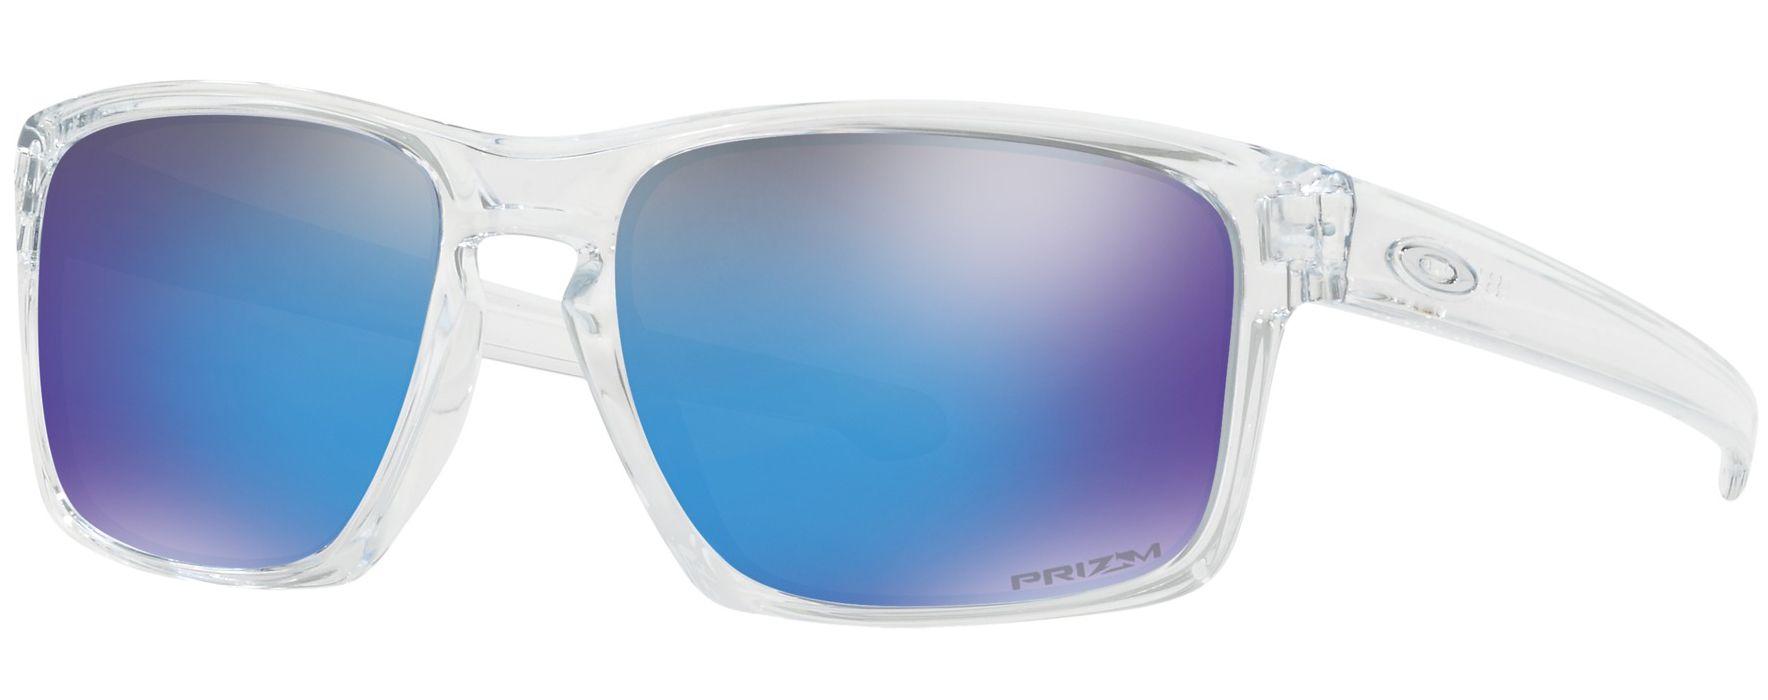 0842416d4f Oakley Silver Prizm Clear Mens Sunglasses - OO9262-4757